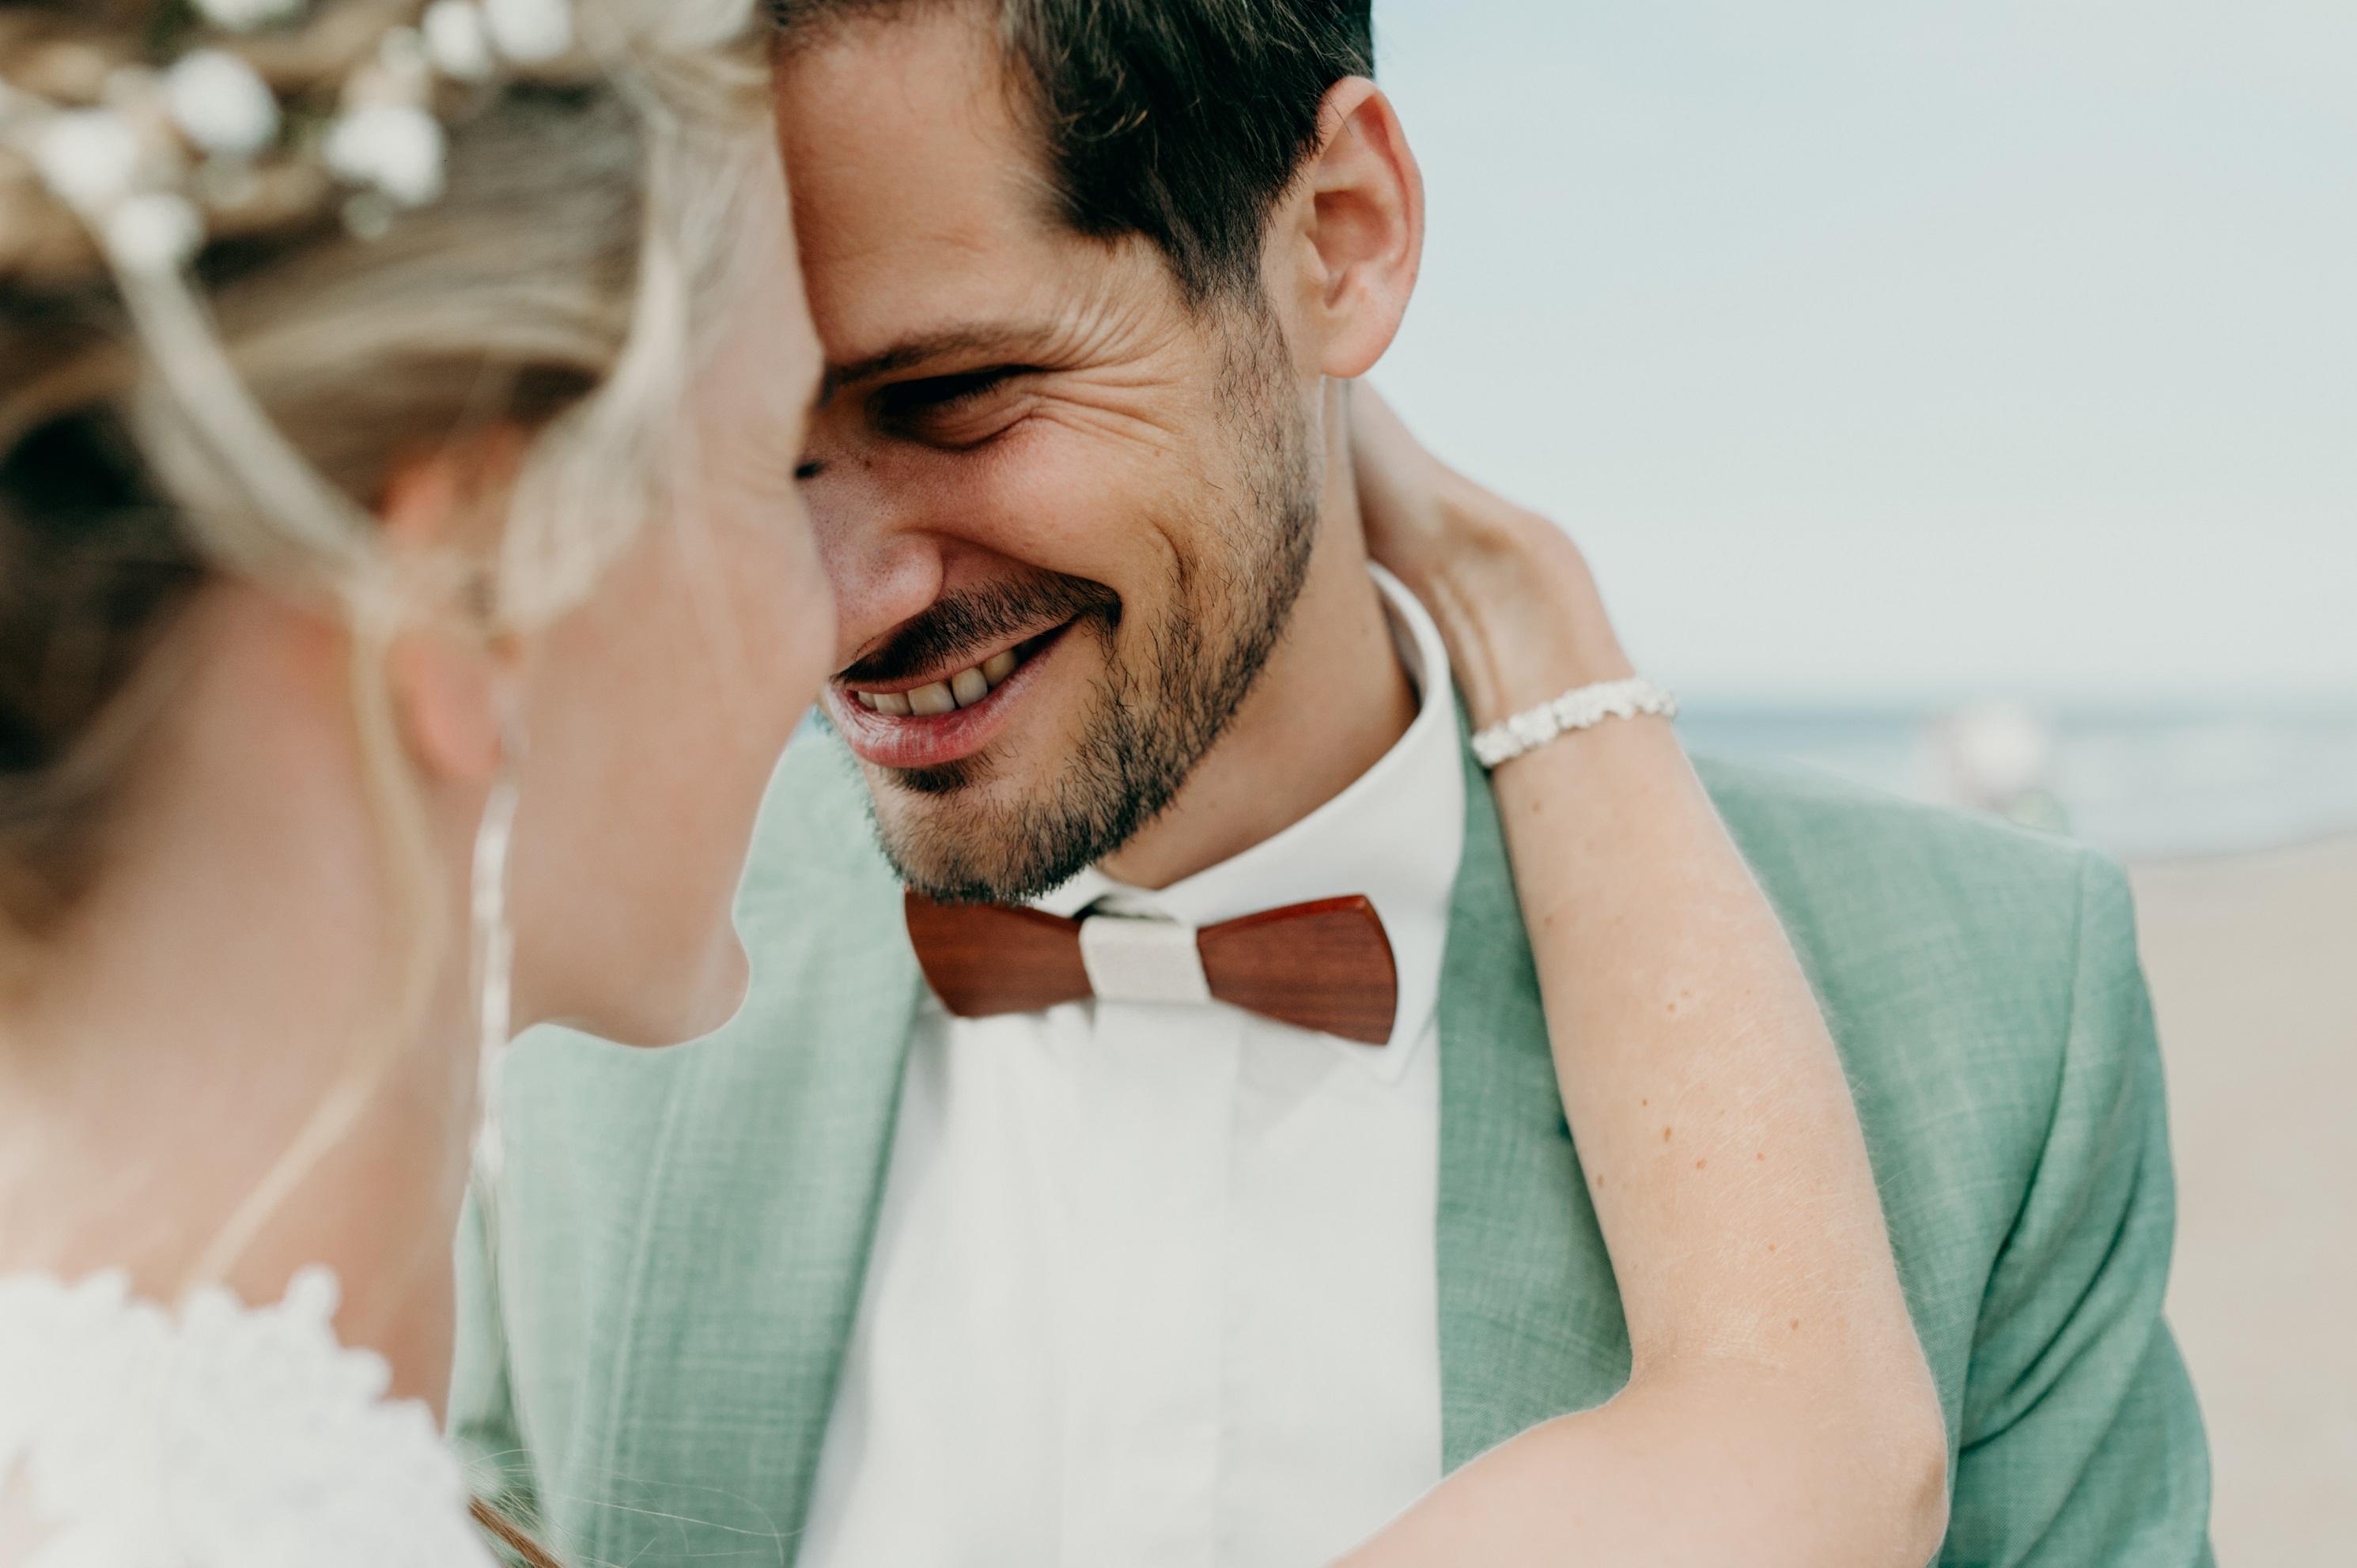 fotoreportage wanneer bruiloft